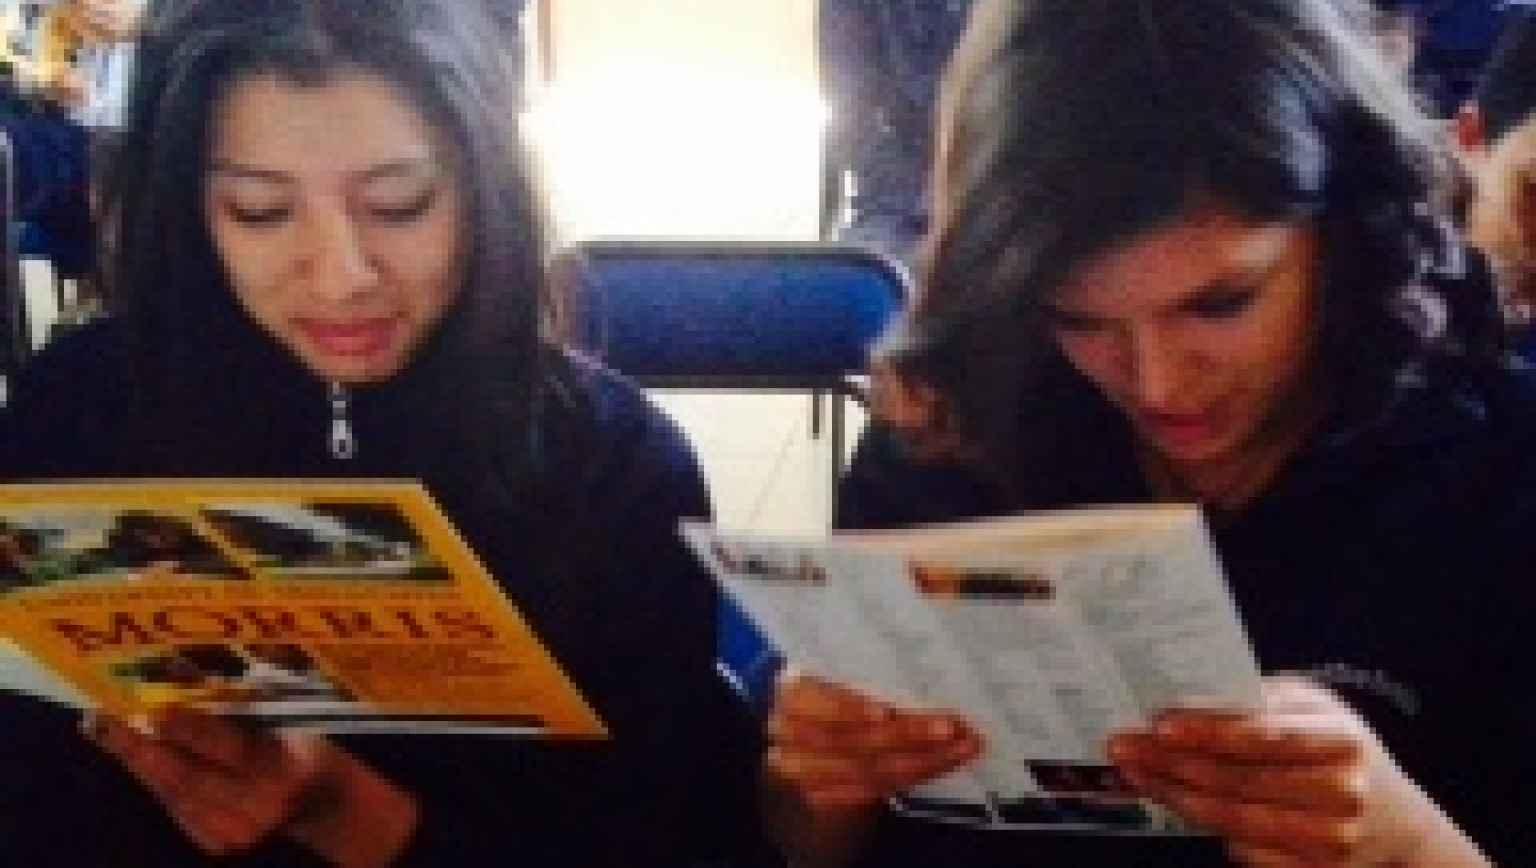 US Universities visit EducationUSA Cuenca